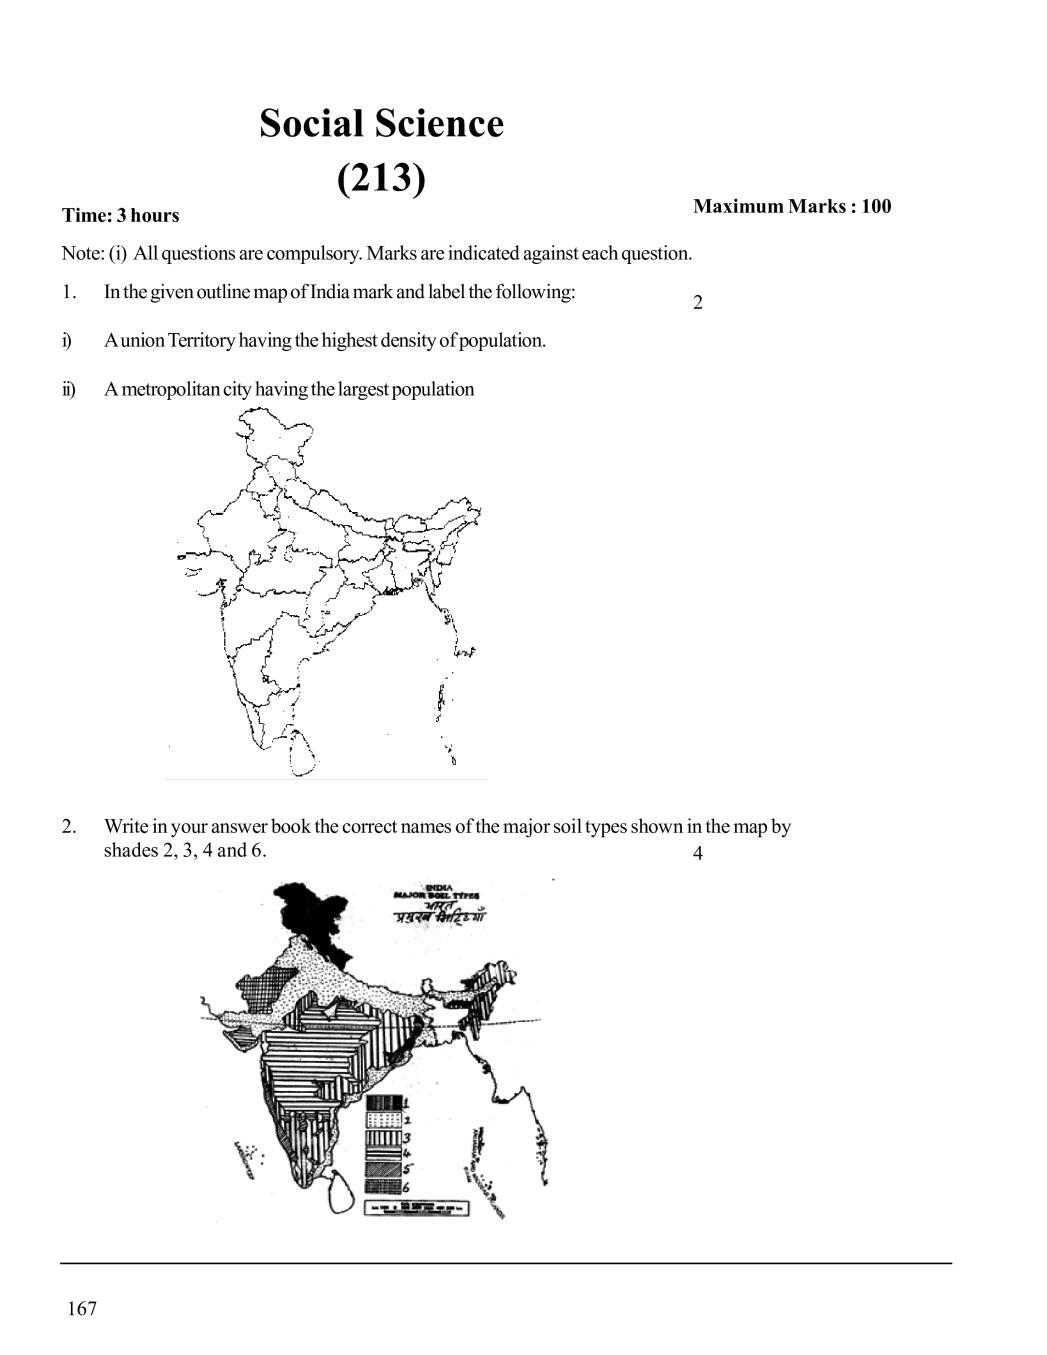 NIOS Class 10 Sample Paper 2020 - Social Science - Page 1